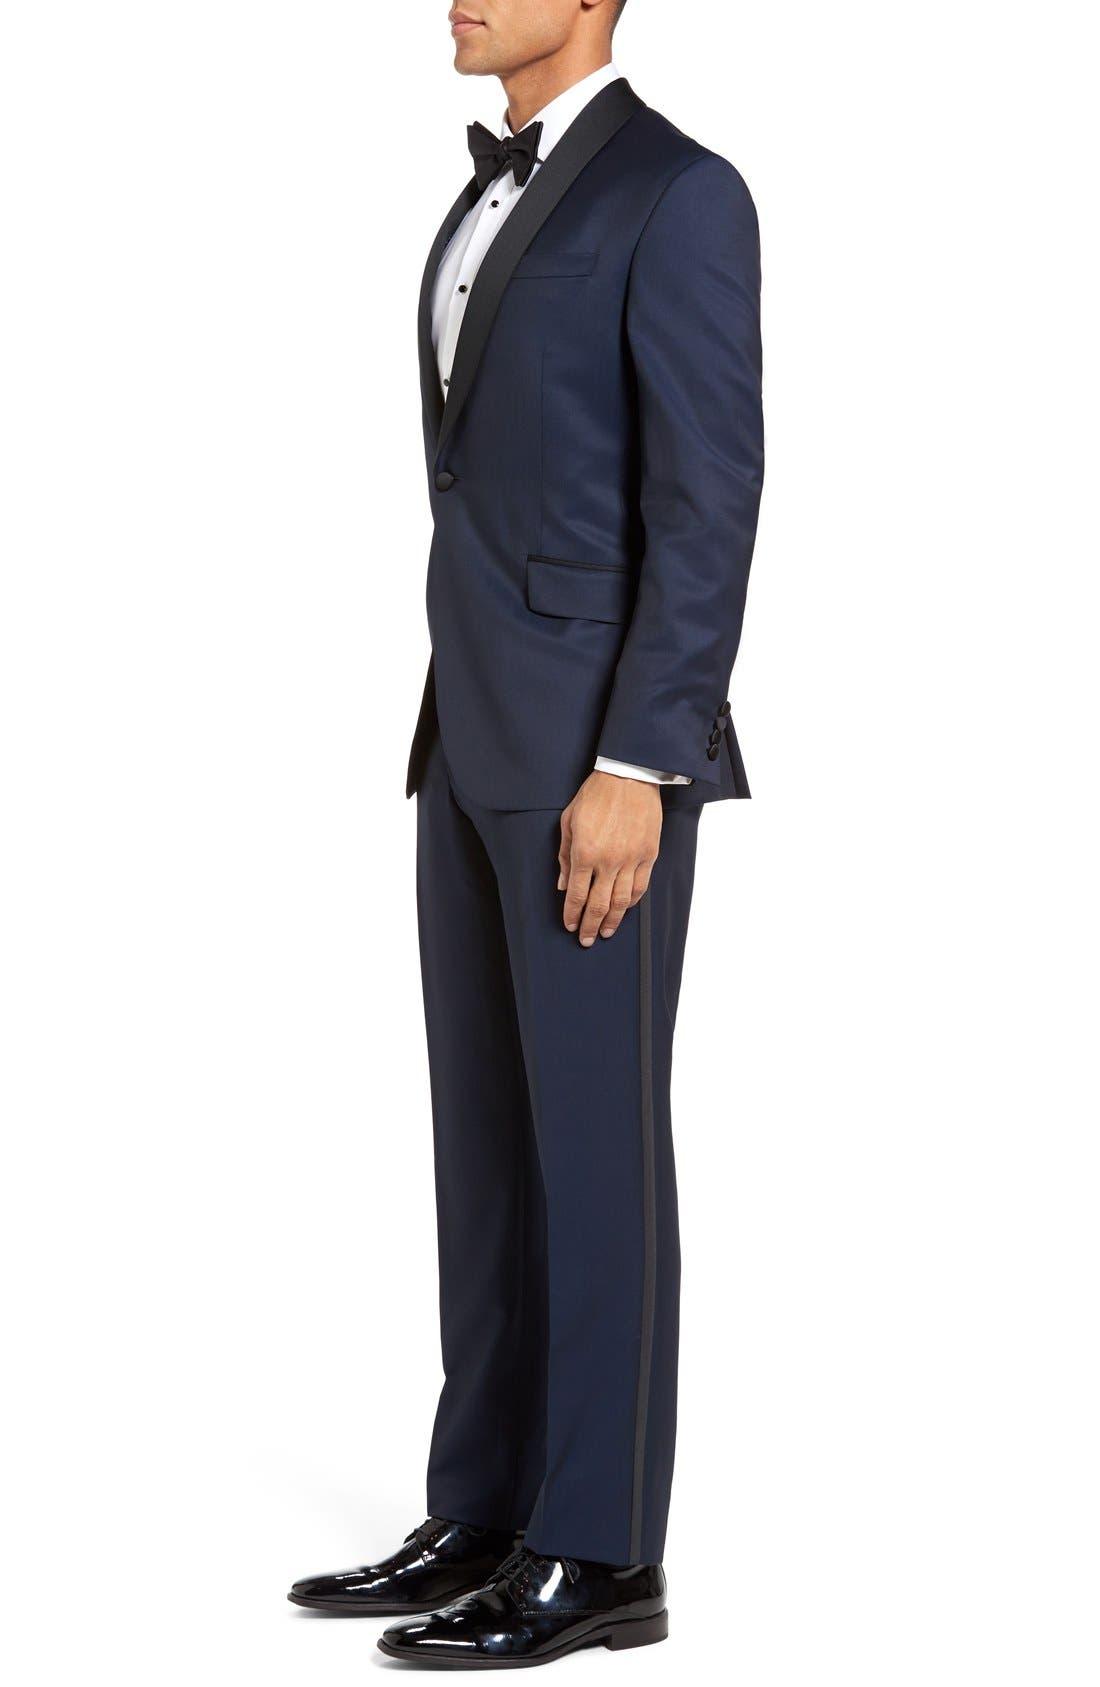 'Josh' Trim Fit Navy Shawl Lapel Tuxedo,                             Alternate thumbnail 6, color,                             NAVY BLUE